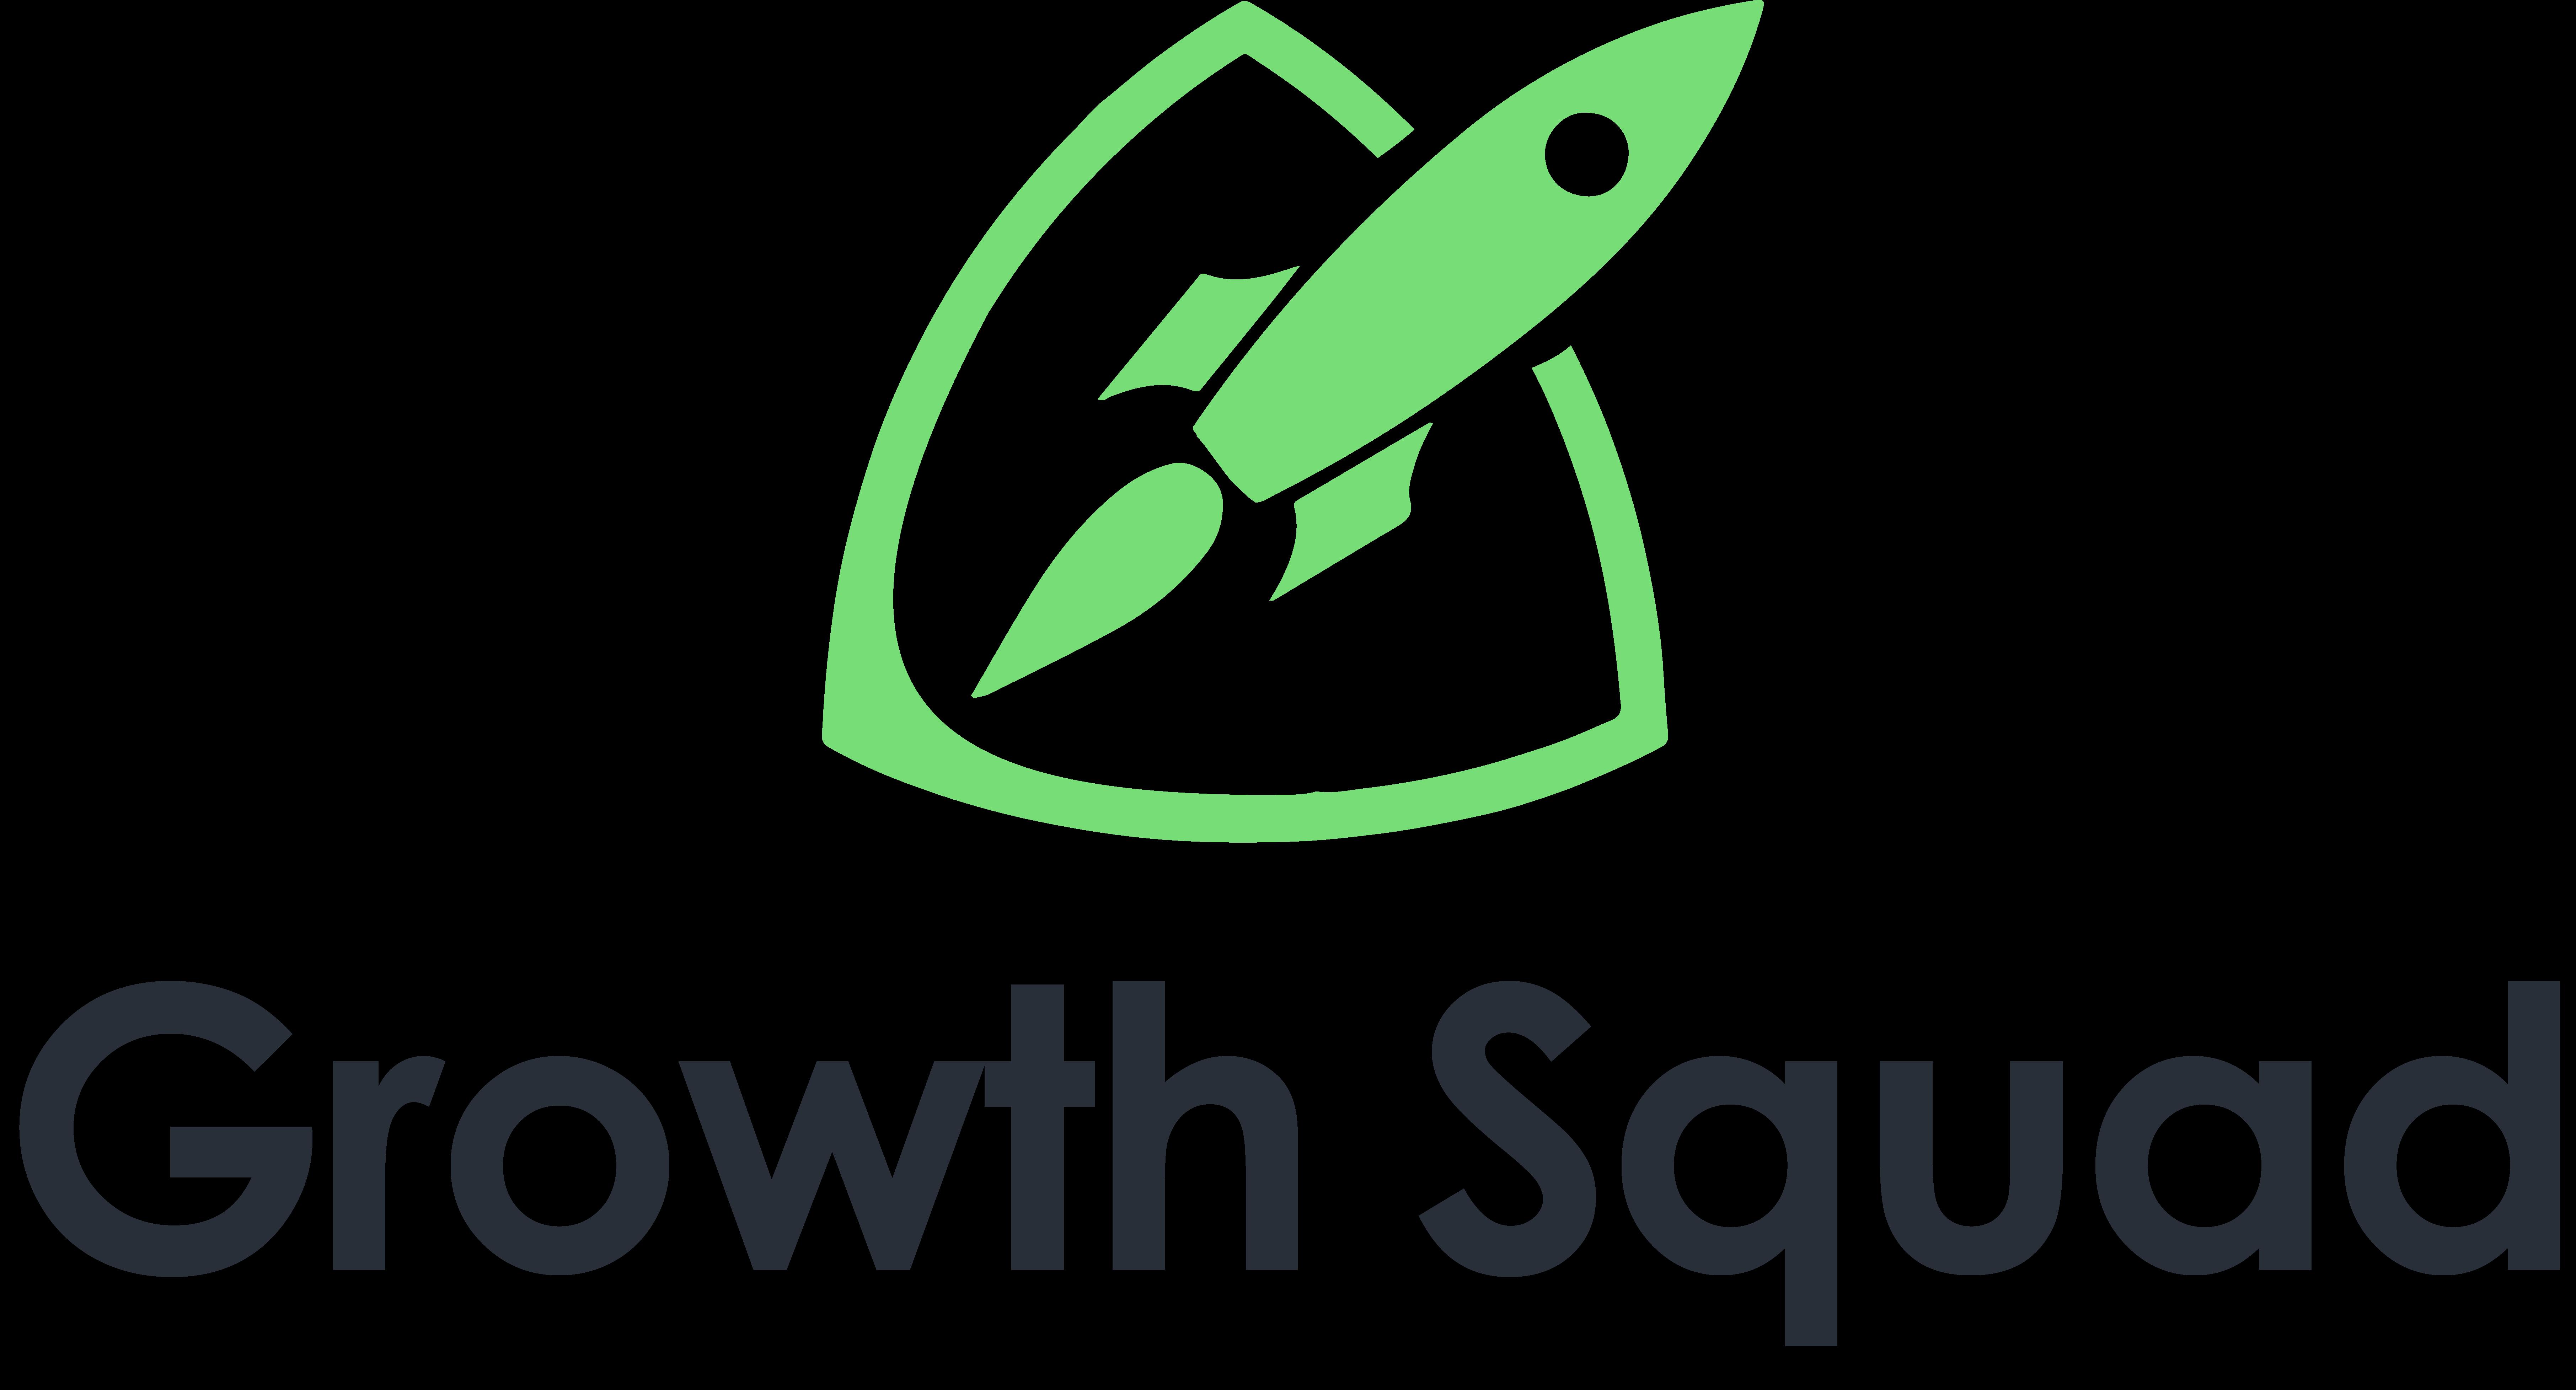 Growth Squad